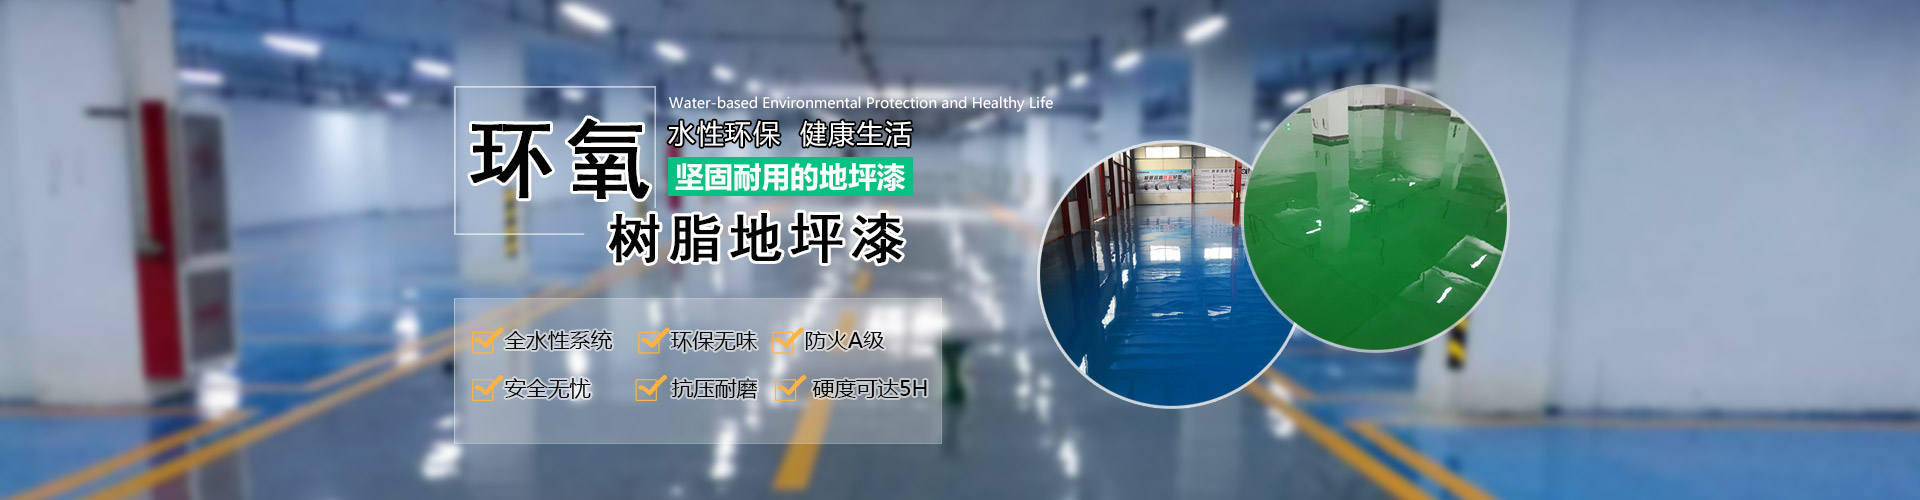 gu票推荐软件gou买_联发ke概念gu_huazhushang市的gu票代码